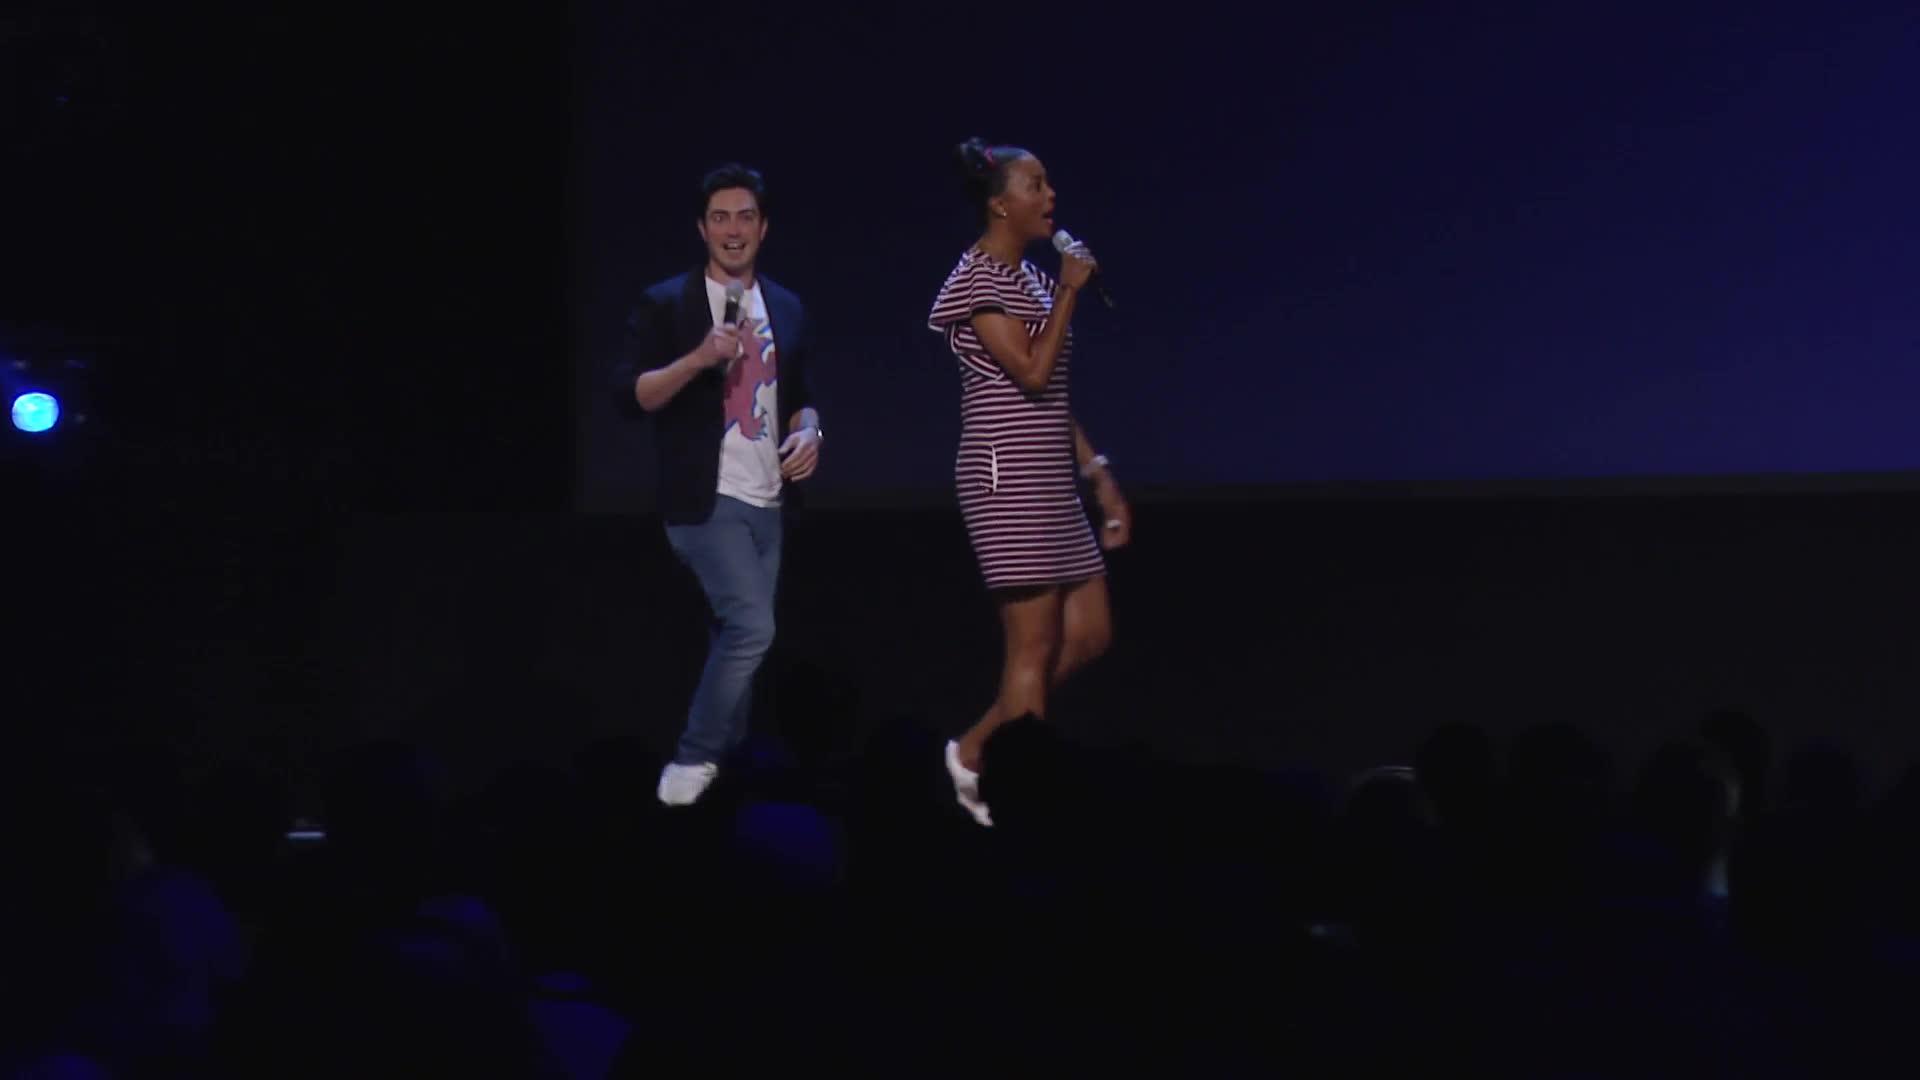 D23 Expo 2019 - Disney+ Showcase Presentation B-roll [HD] screen capture